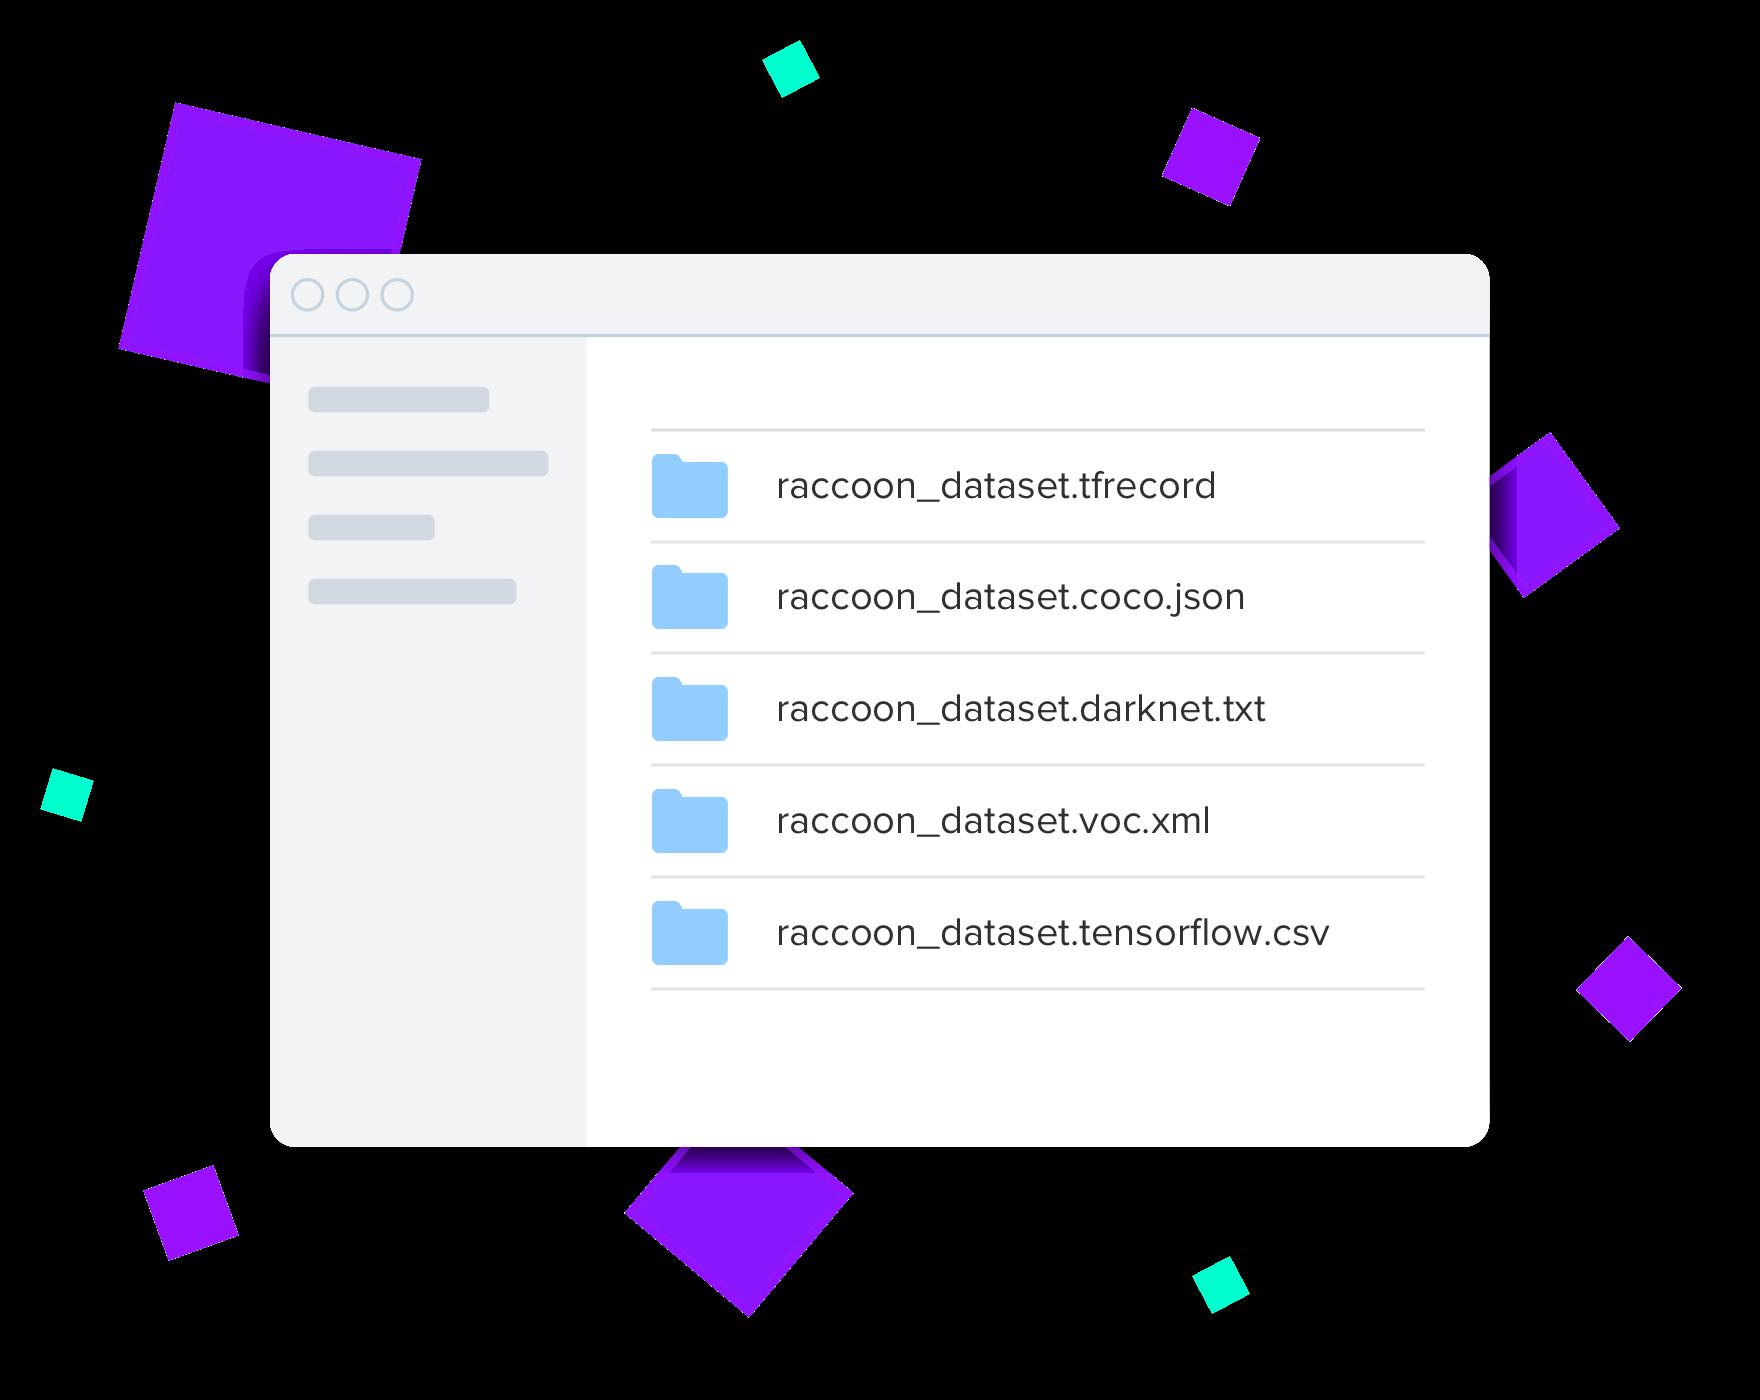 Roboflow export formats (tfrecord, COCO JSON, Darknet TXT, VOC XML, Tensorflow CSV)